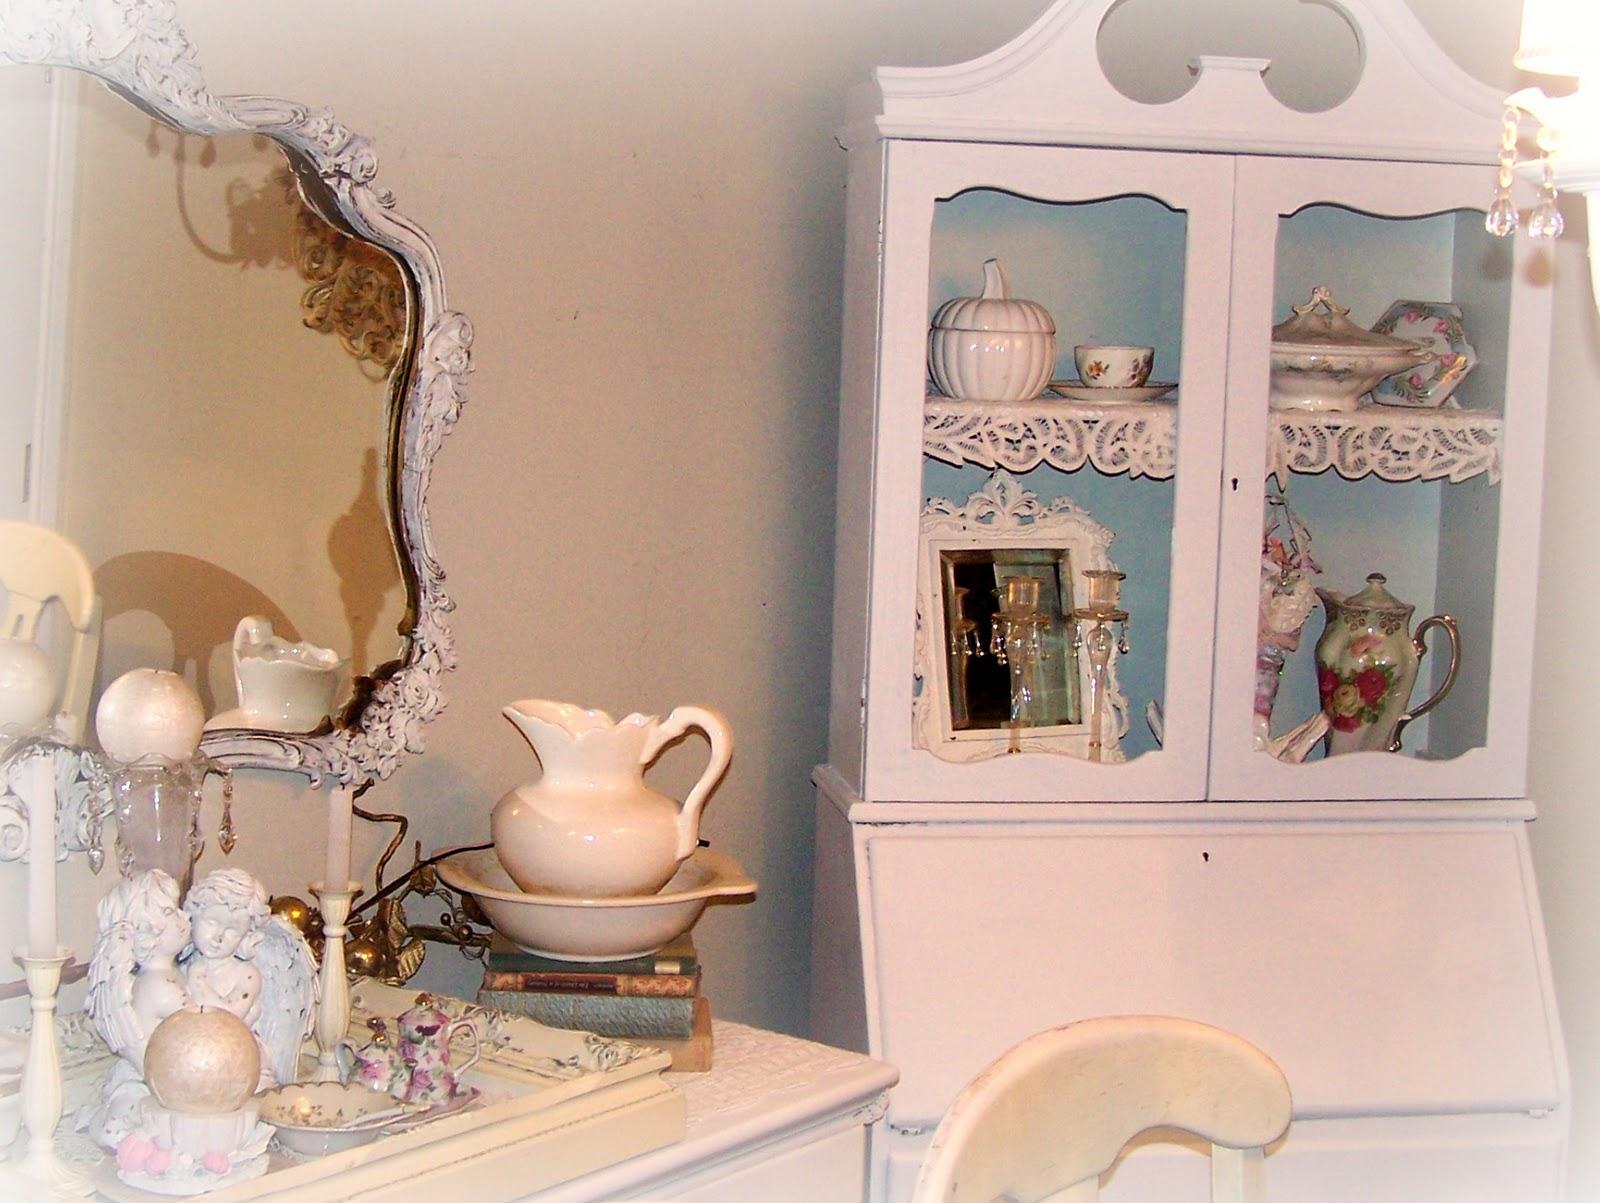 Olivia's Romantic Home: Shabby Chic Cabinet Transformation!